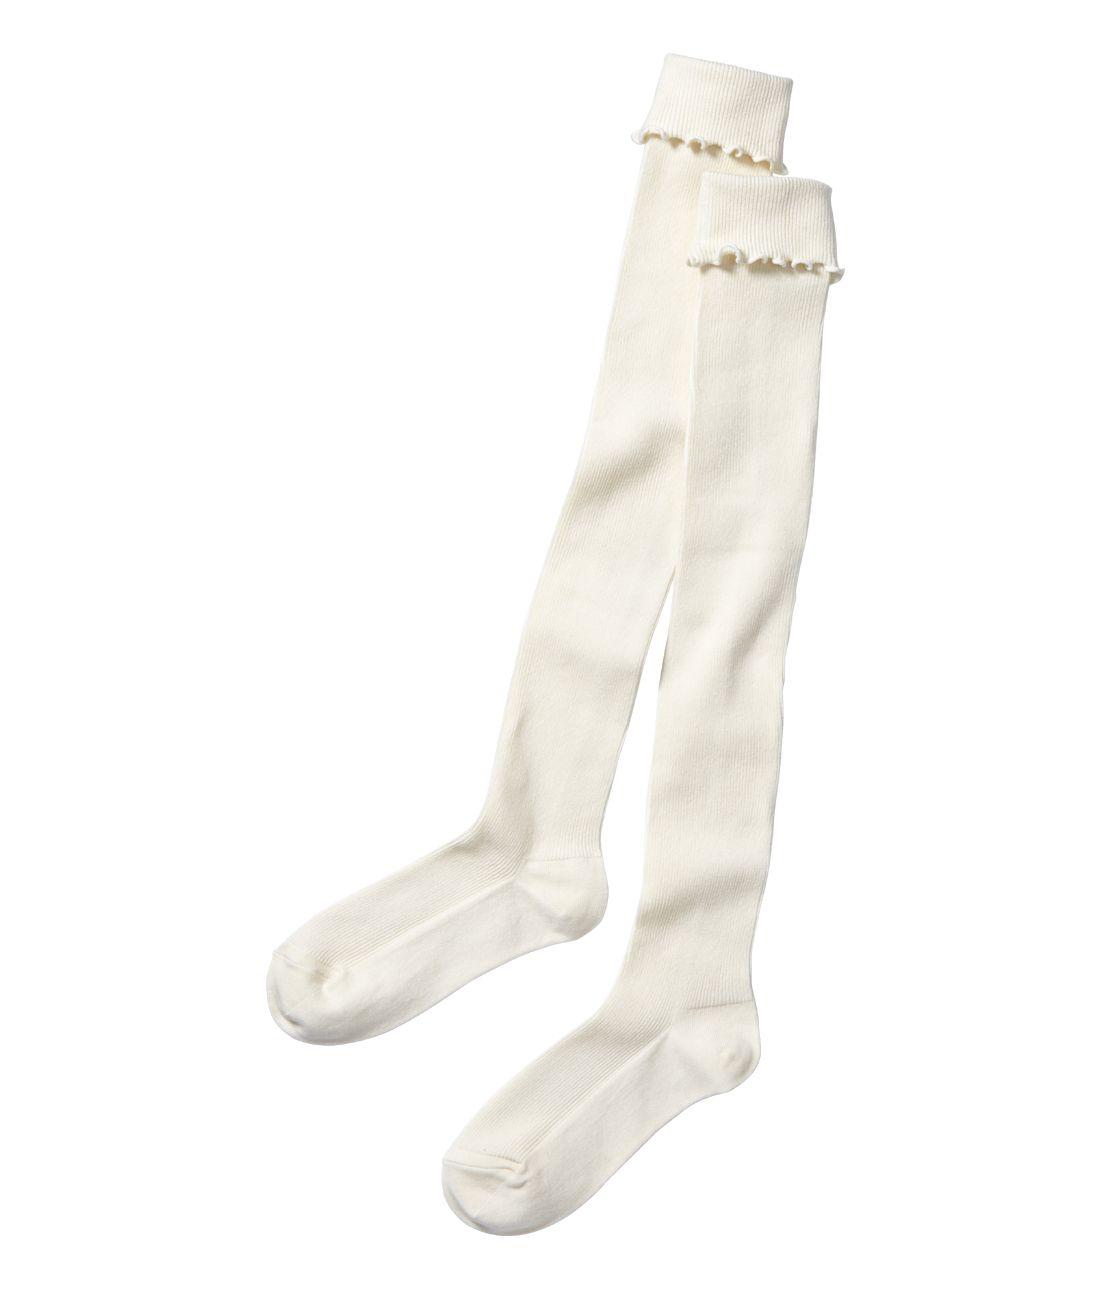 Rib Knee High Socks